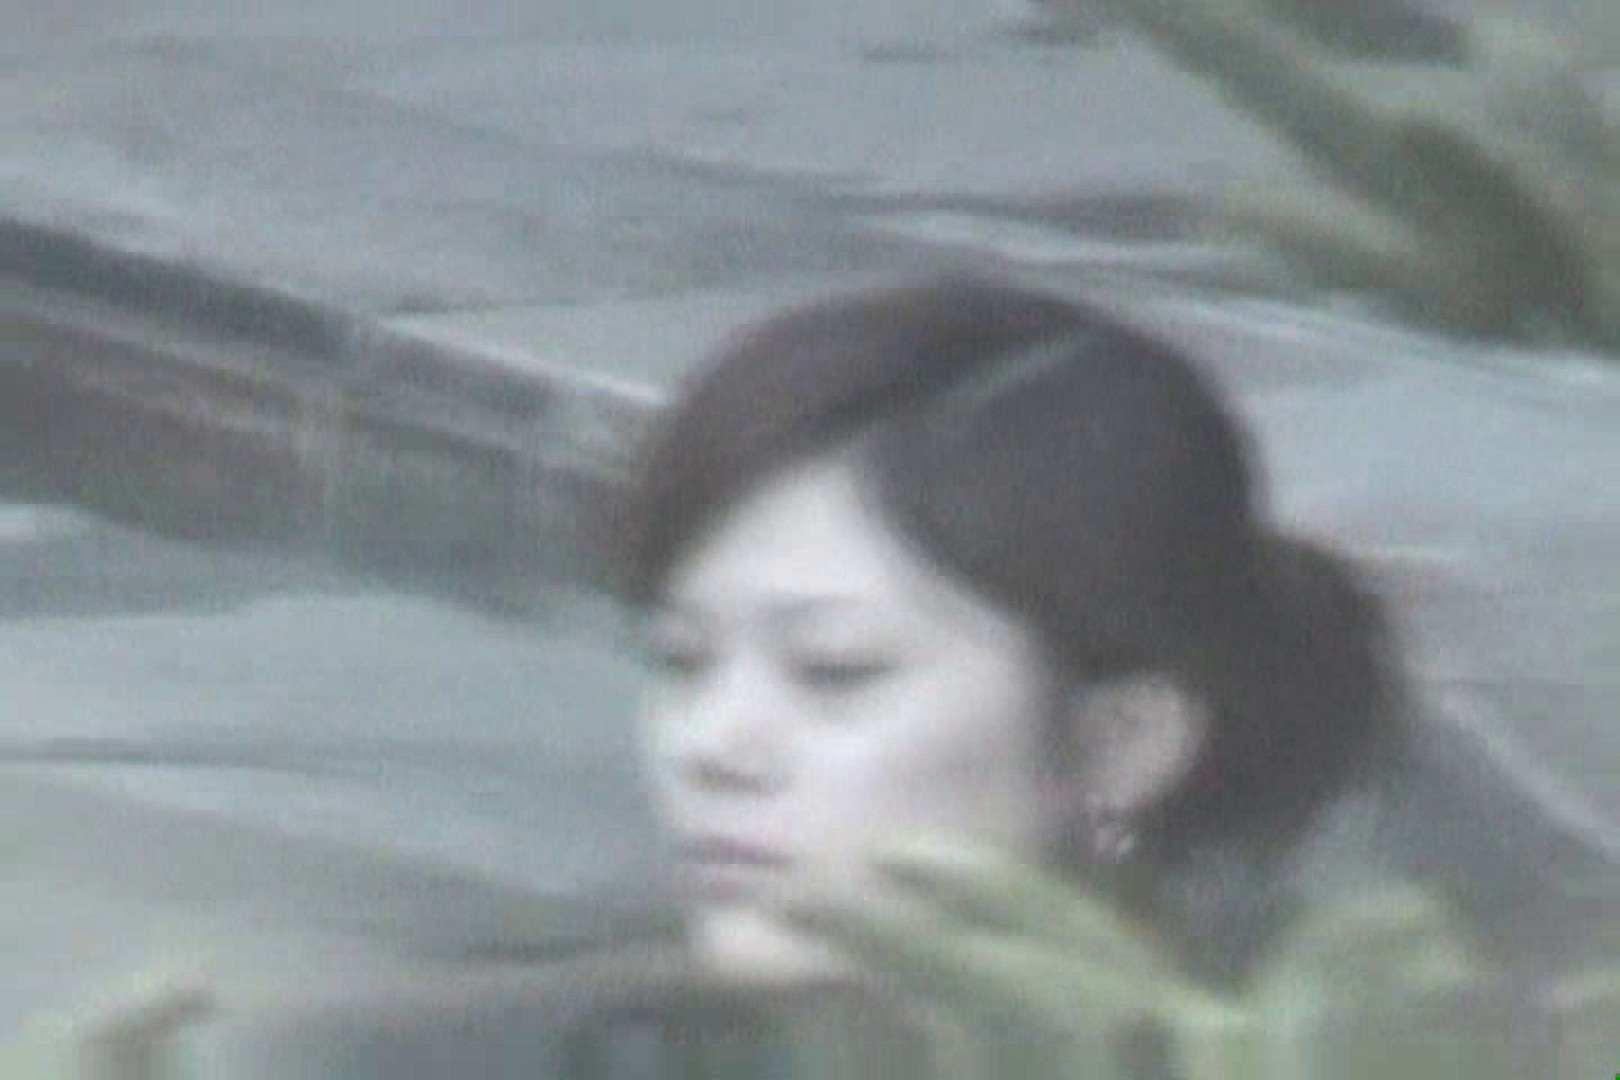 Aquaな露天風呂Vol.609 盗撮映像  58Pix 20